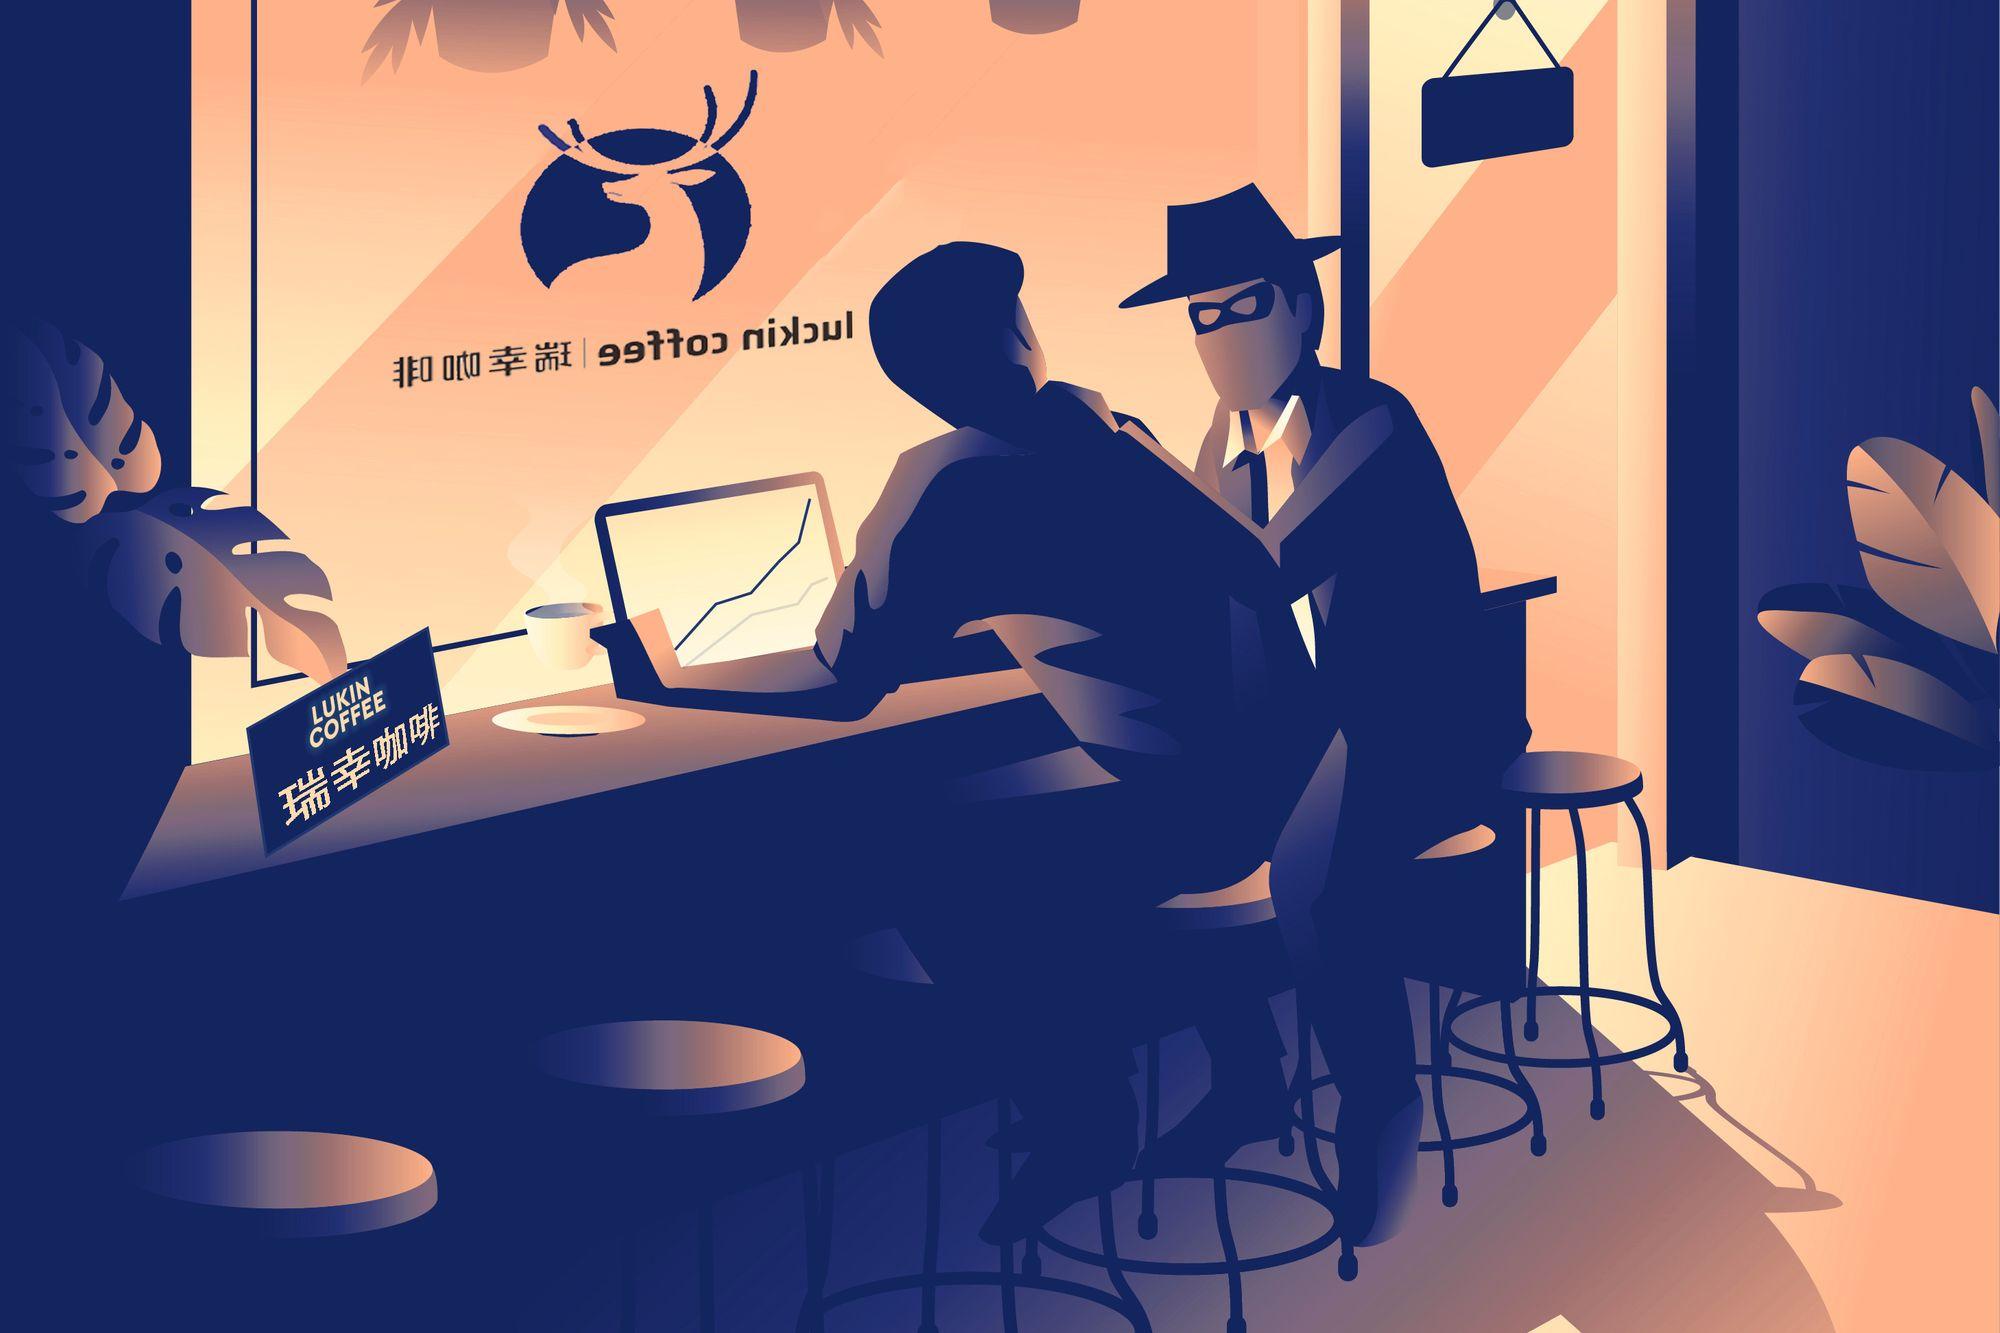 Finshots Recap - The best scam stories from 2020